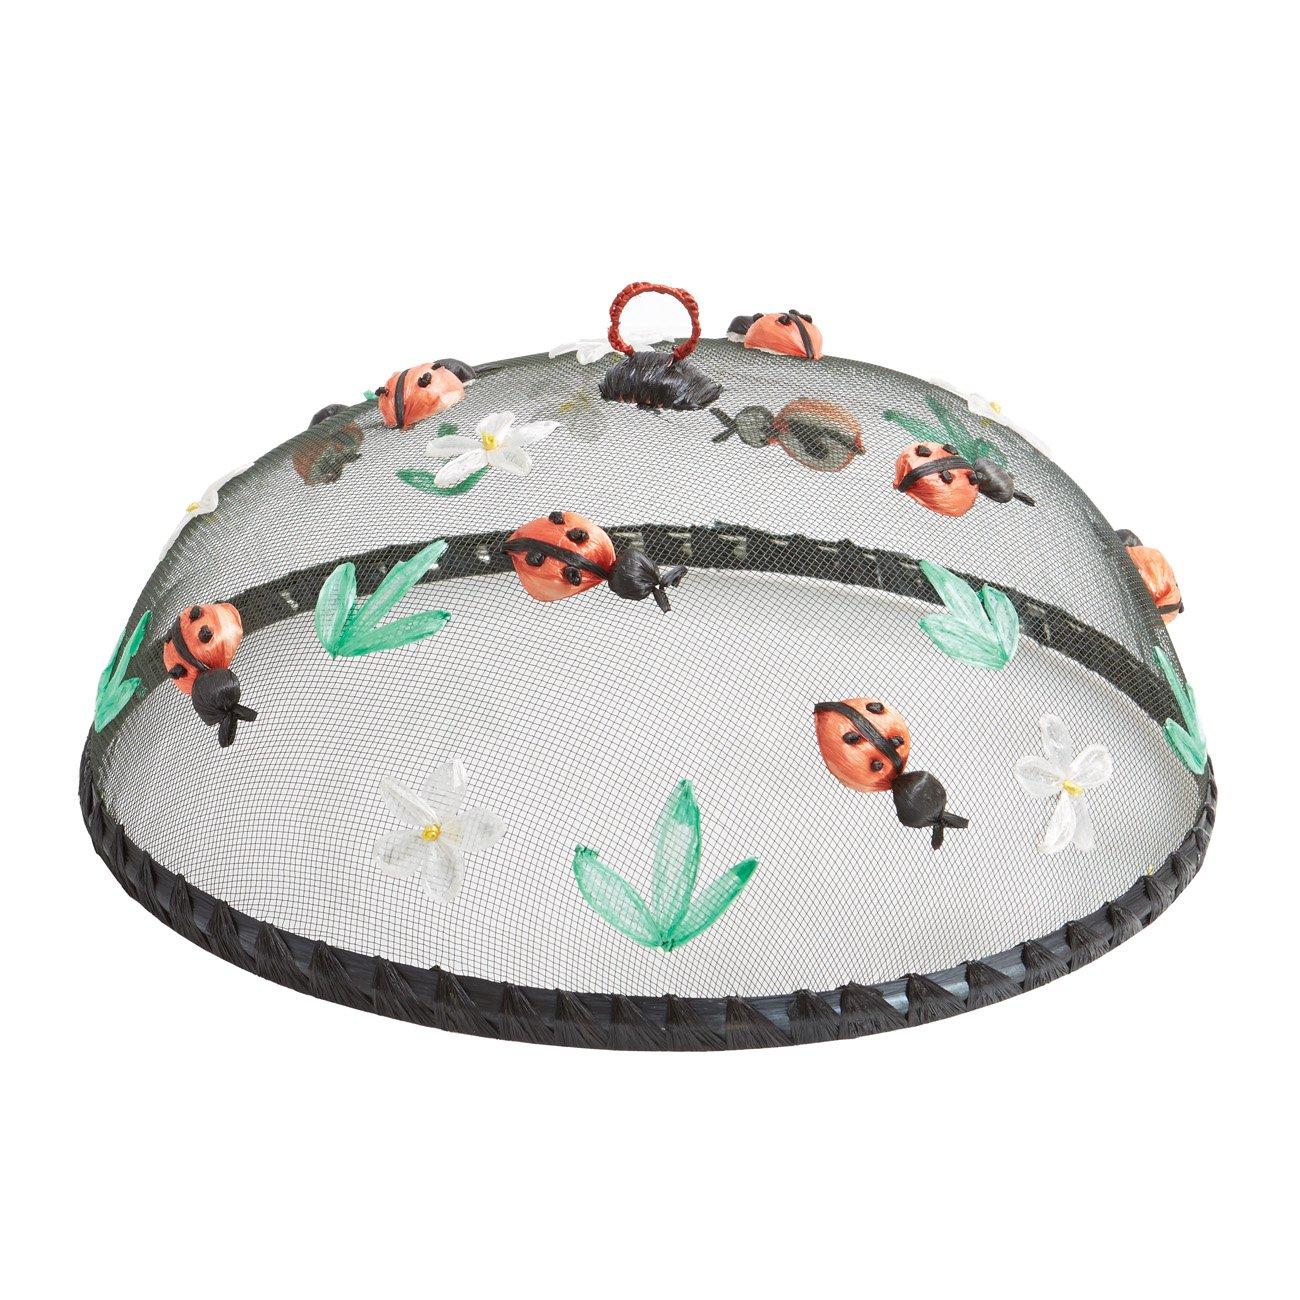 Woodard & Charles WDS004-4A Round Ladybugs Food Domes (Set of 4), 14'' x 5 1/2''